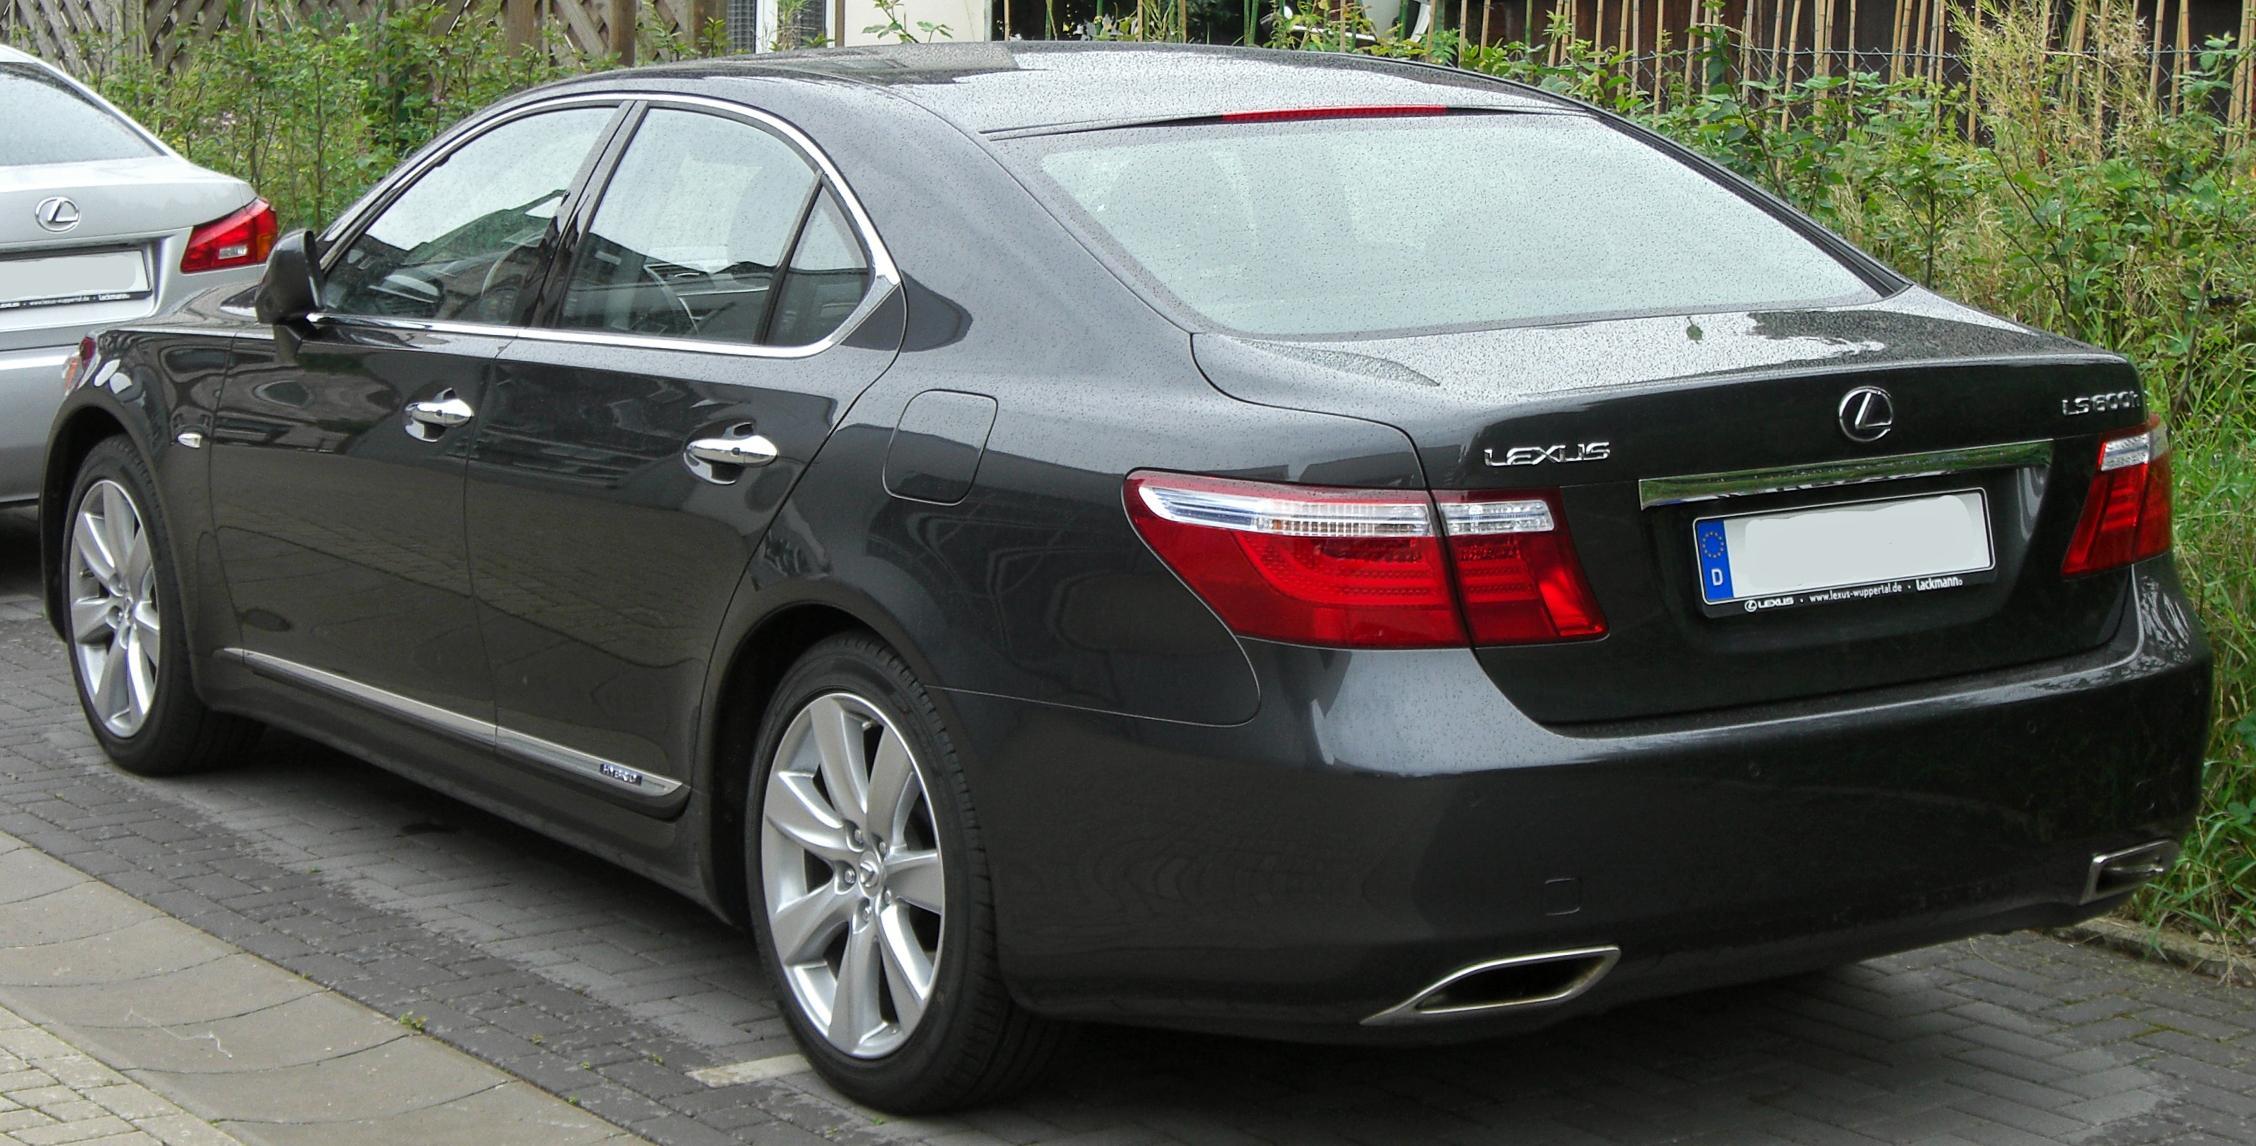 File:Lexus LS 600h rear.JPG - Wikimedia Commonsls lolitas